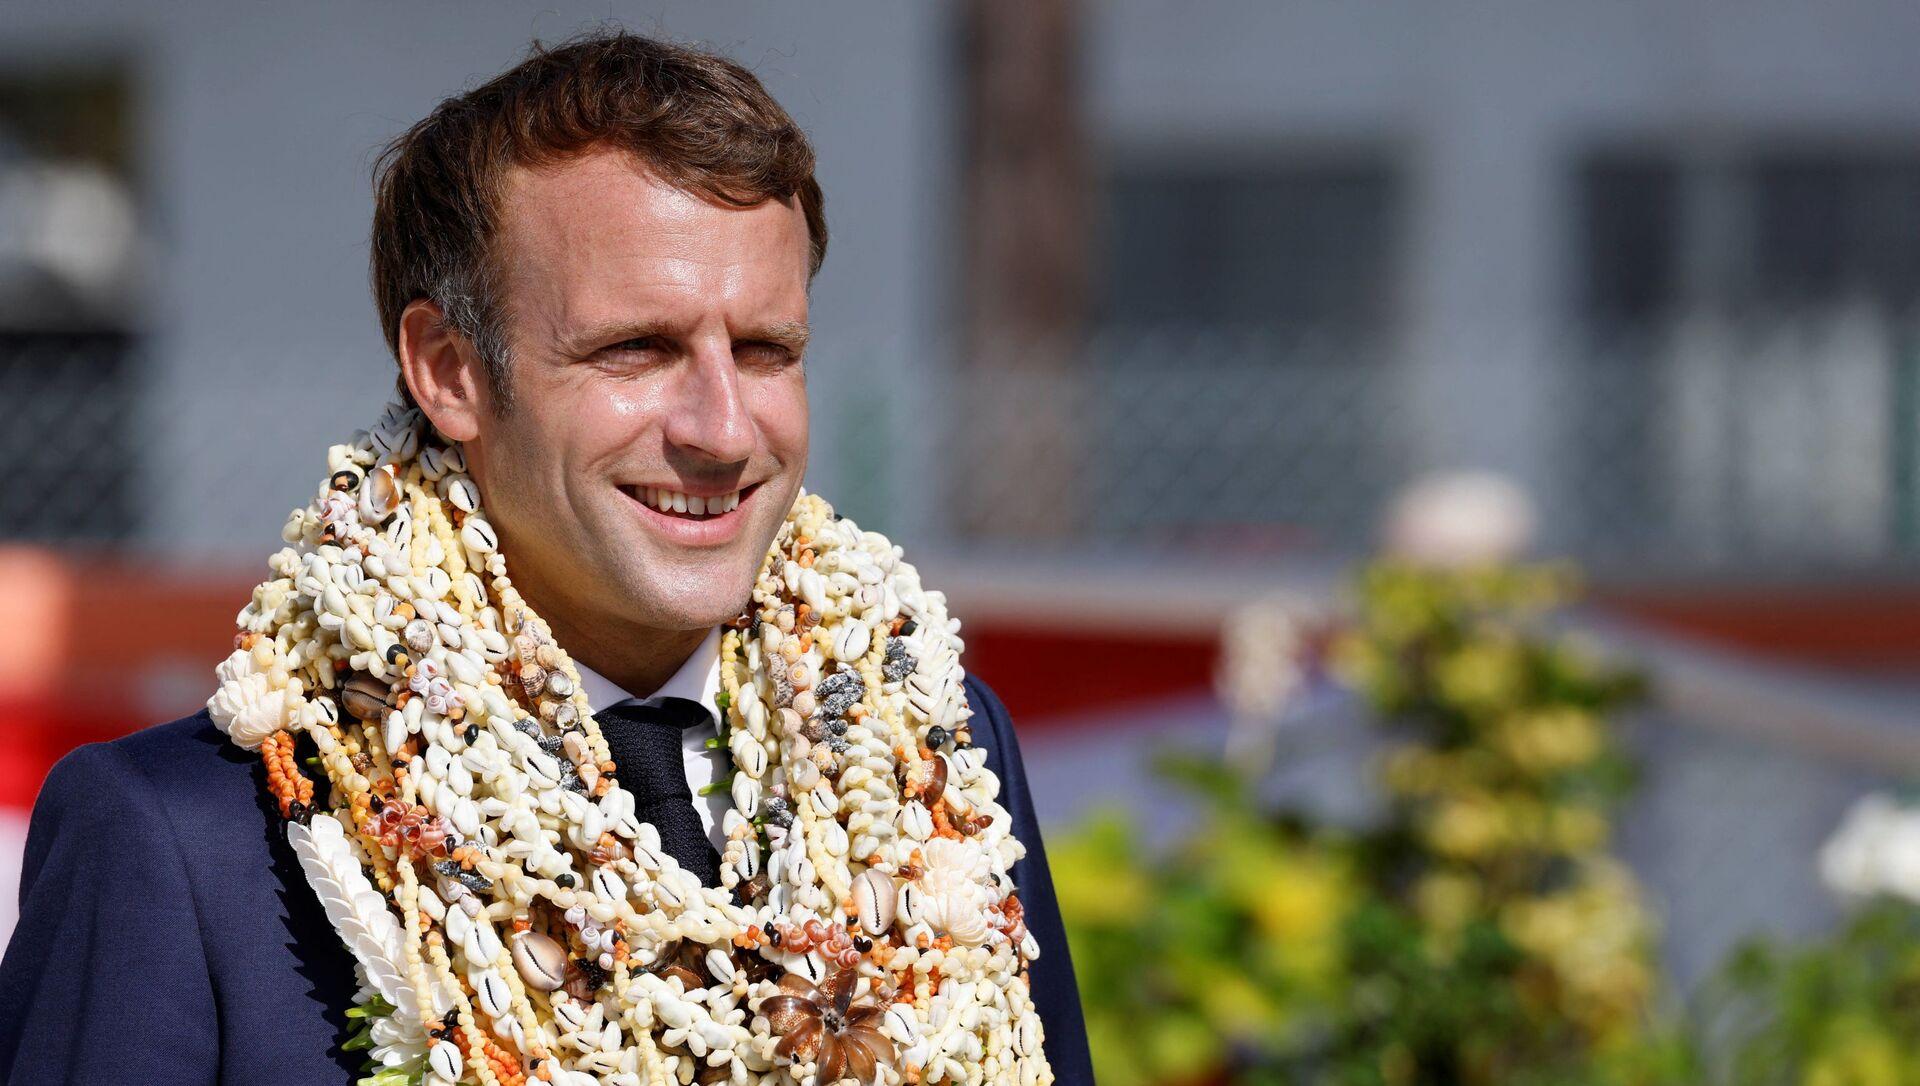 Emmanuel Macron en visite en Polynésie française, le 26 juillet - Sputnik France, 1920, 02.08.2021